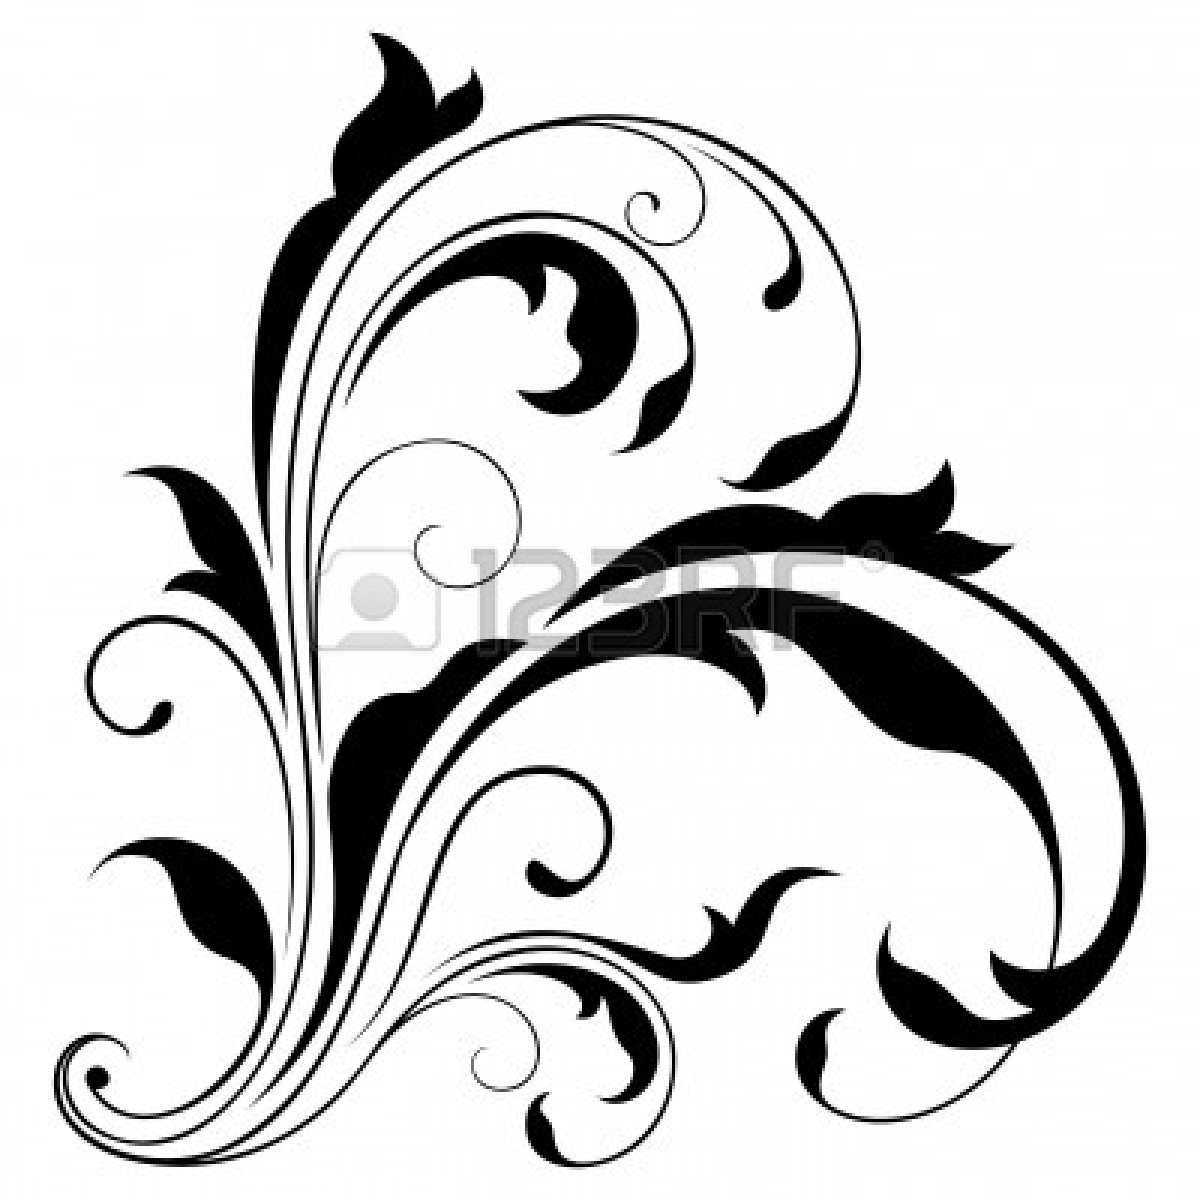 Swirl Art Designs : Black swirls designs bing images